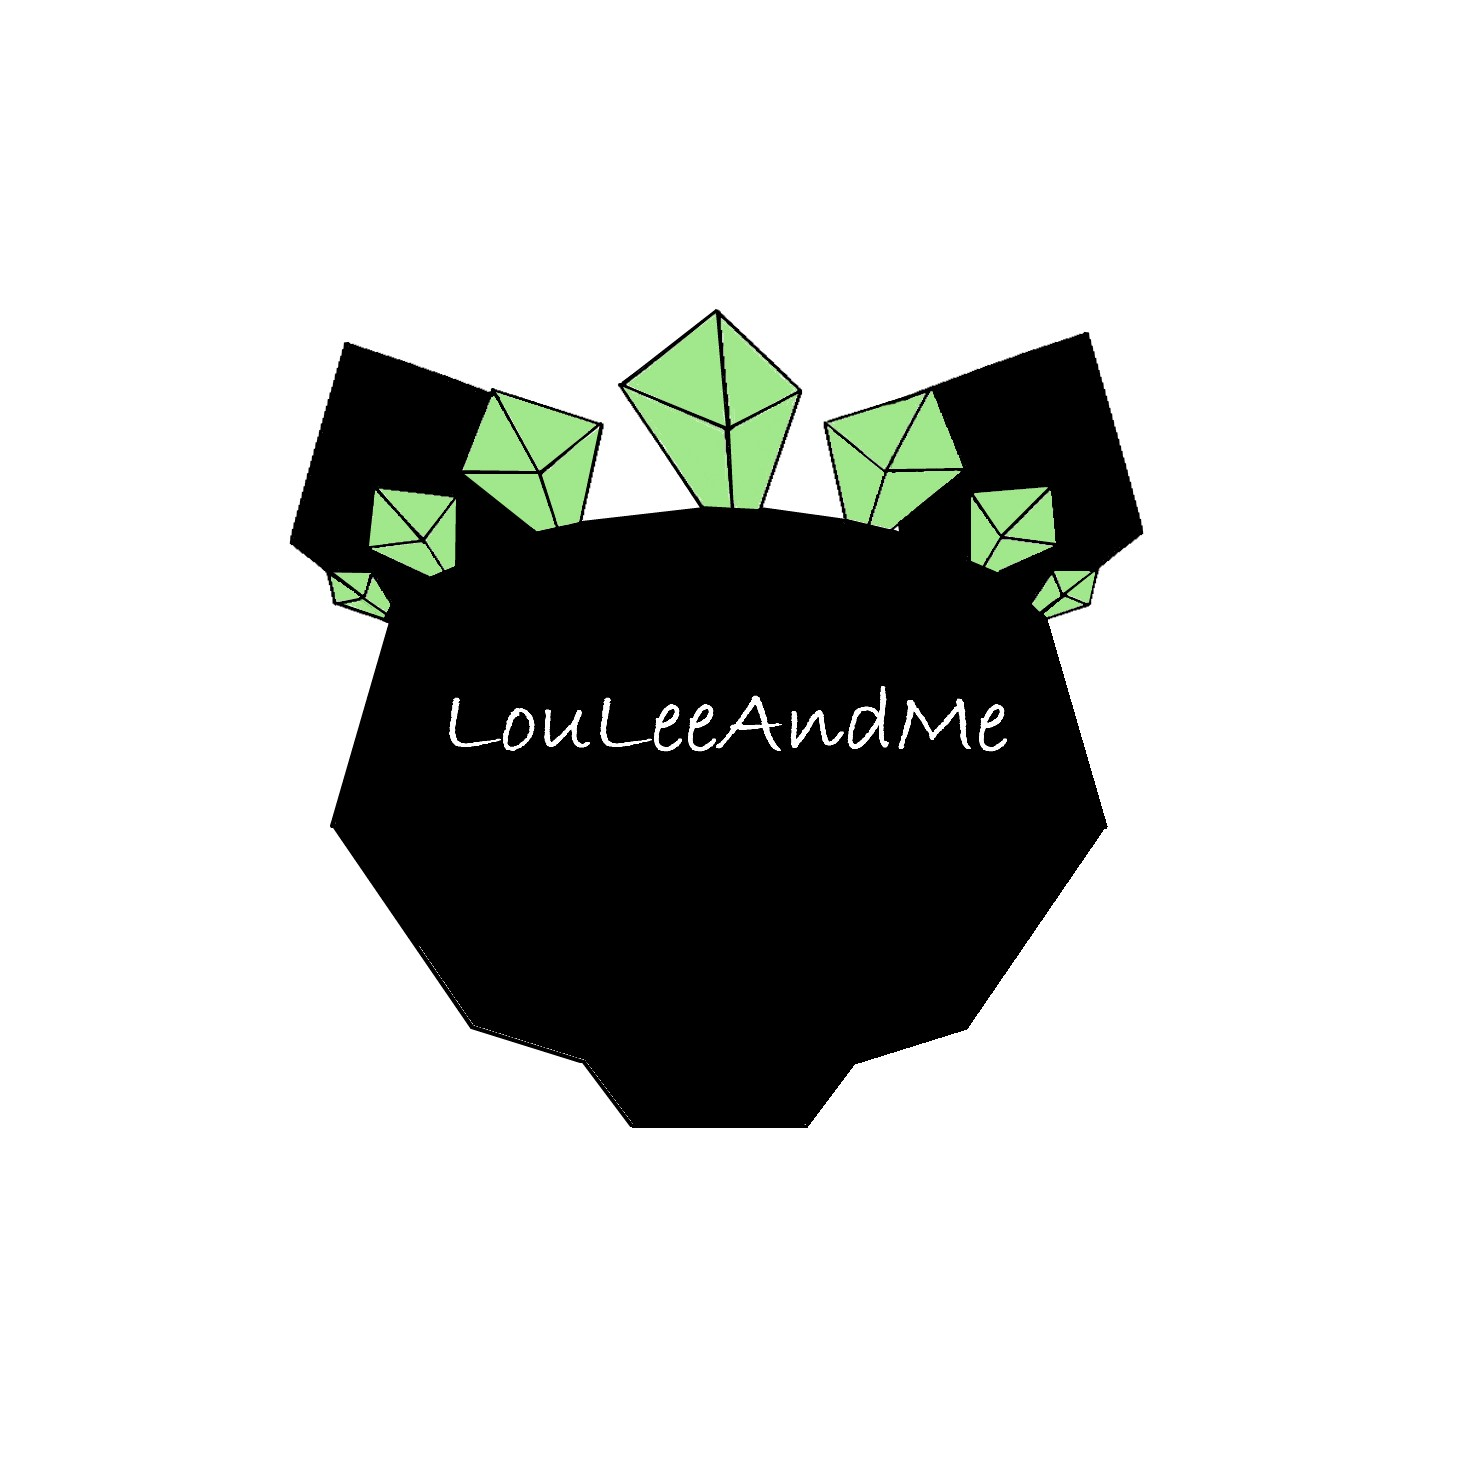 LouLeeAndMe